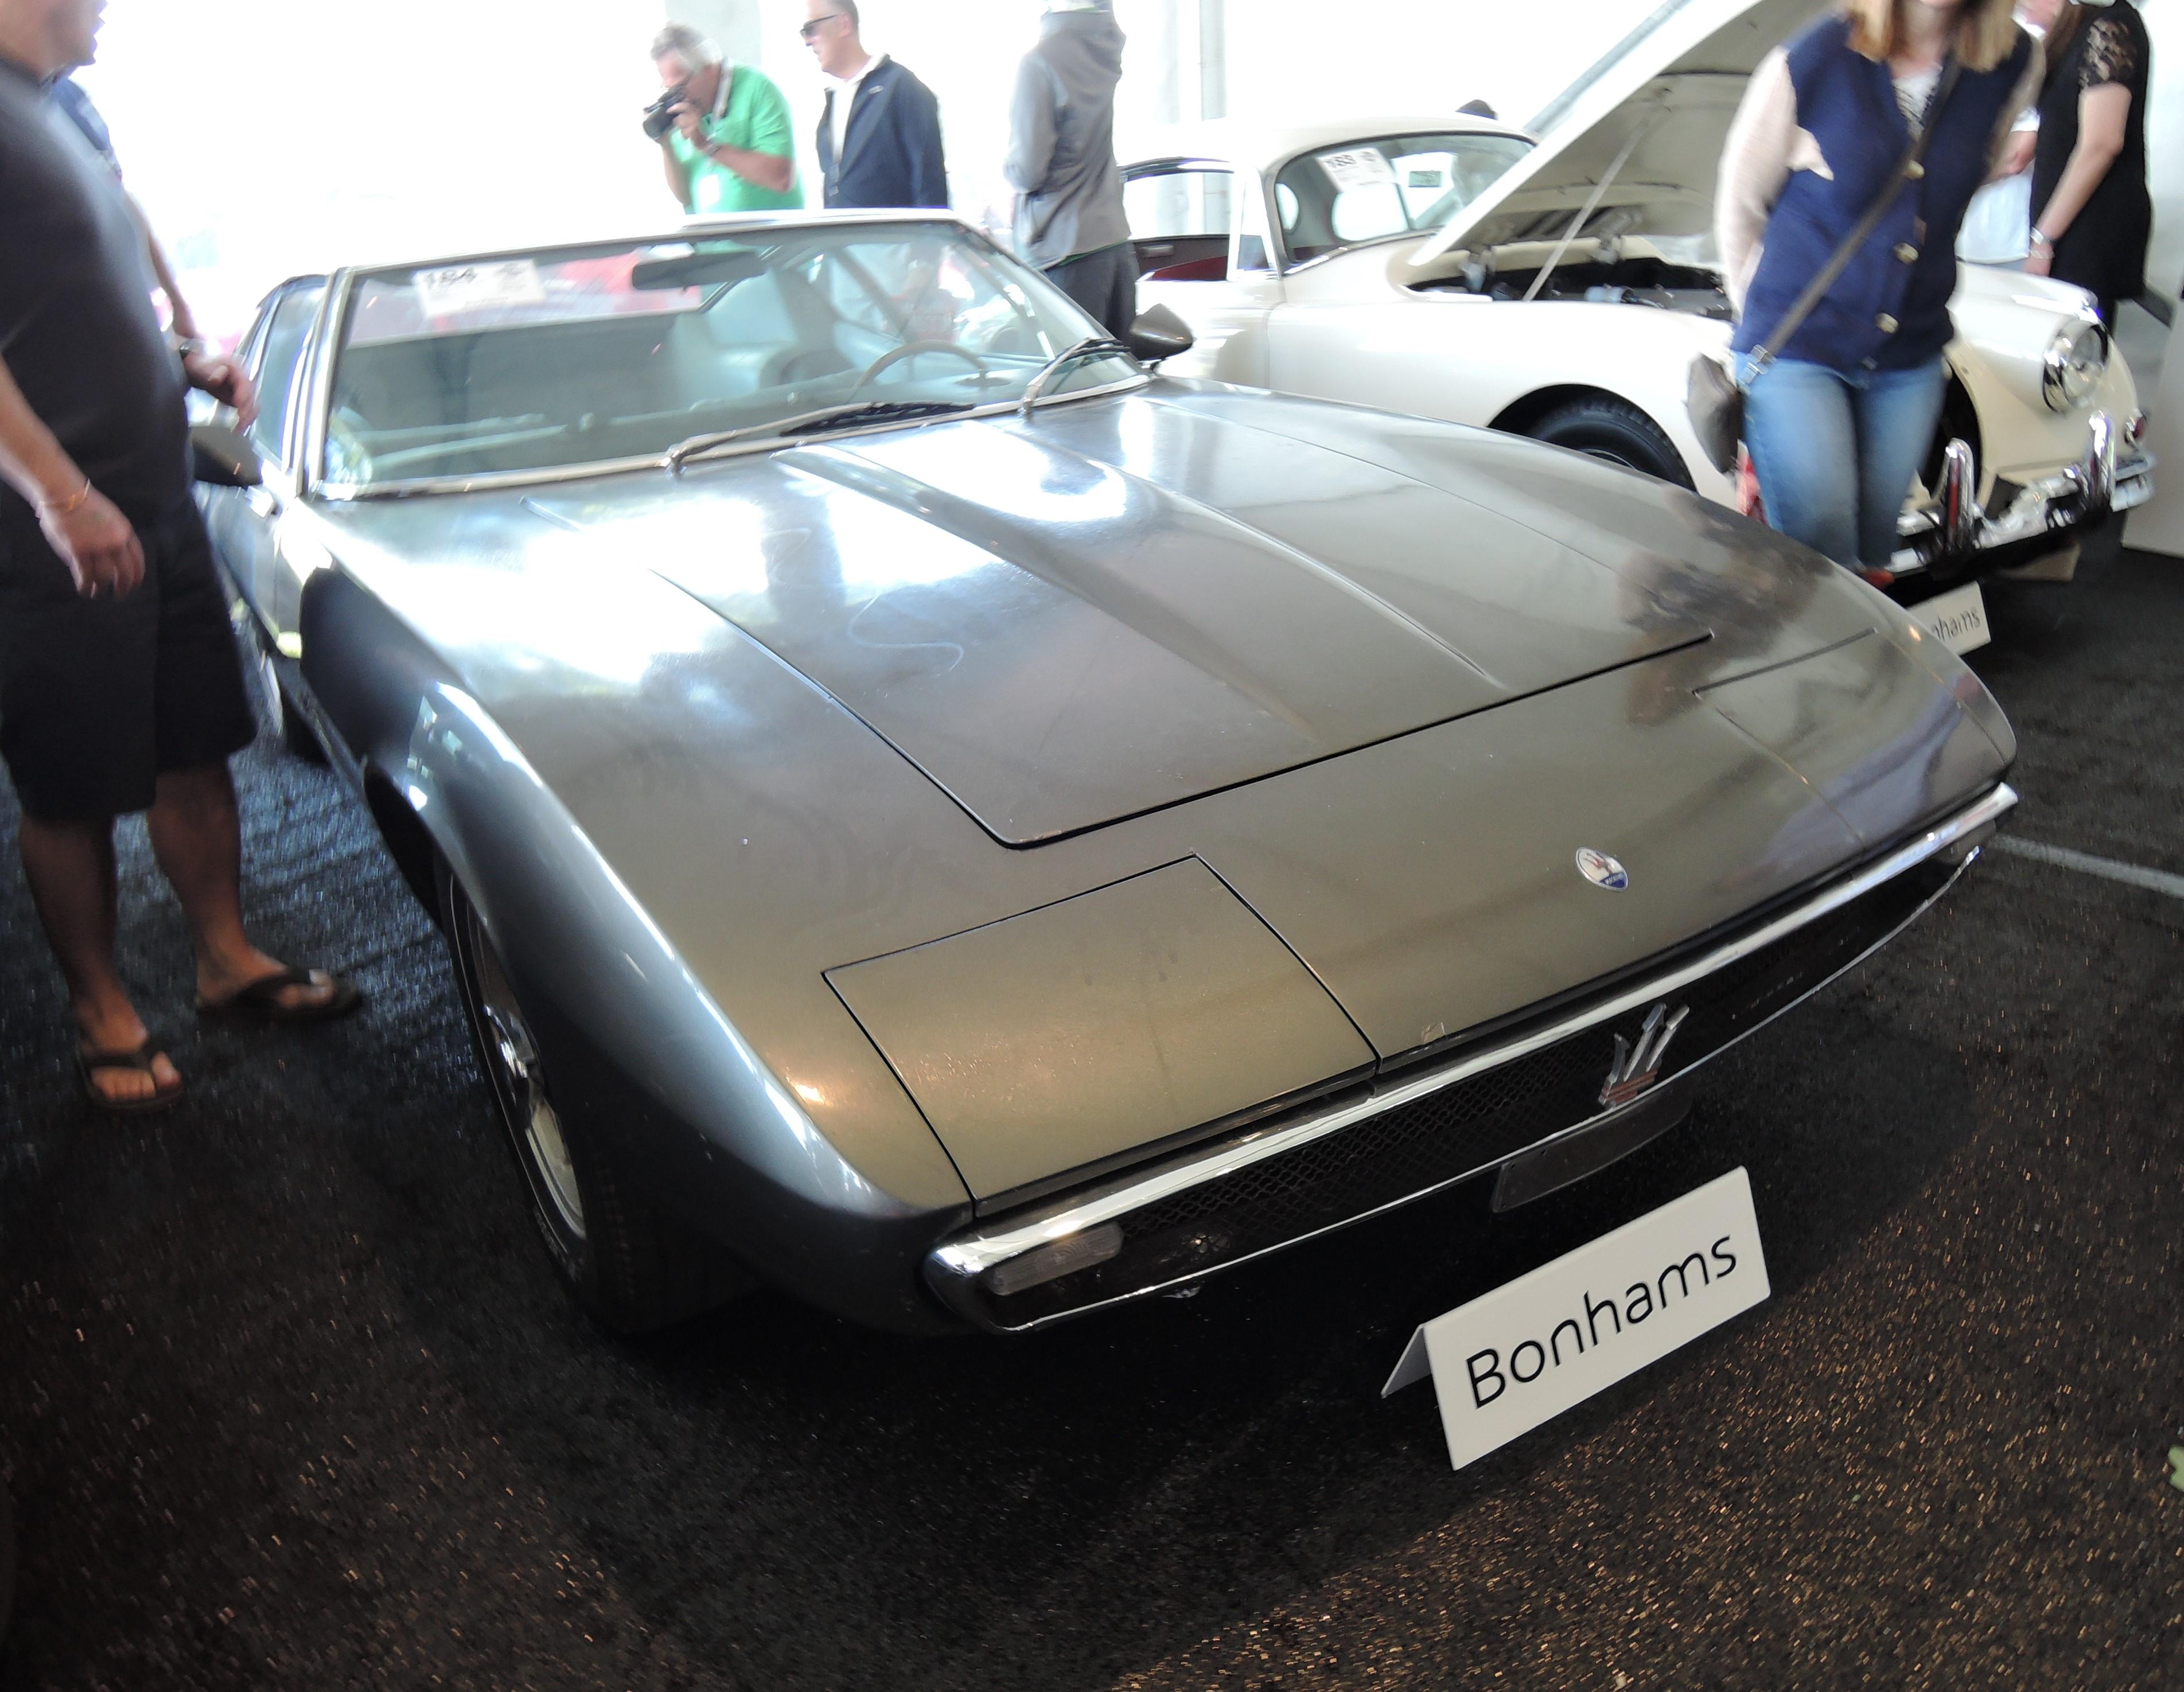 bonhams grey 1967 Maserati Ghibli 4.7 Coupe - Greenwich Concours d'Elegance 2017